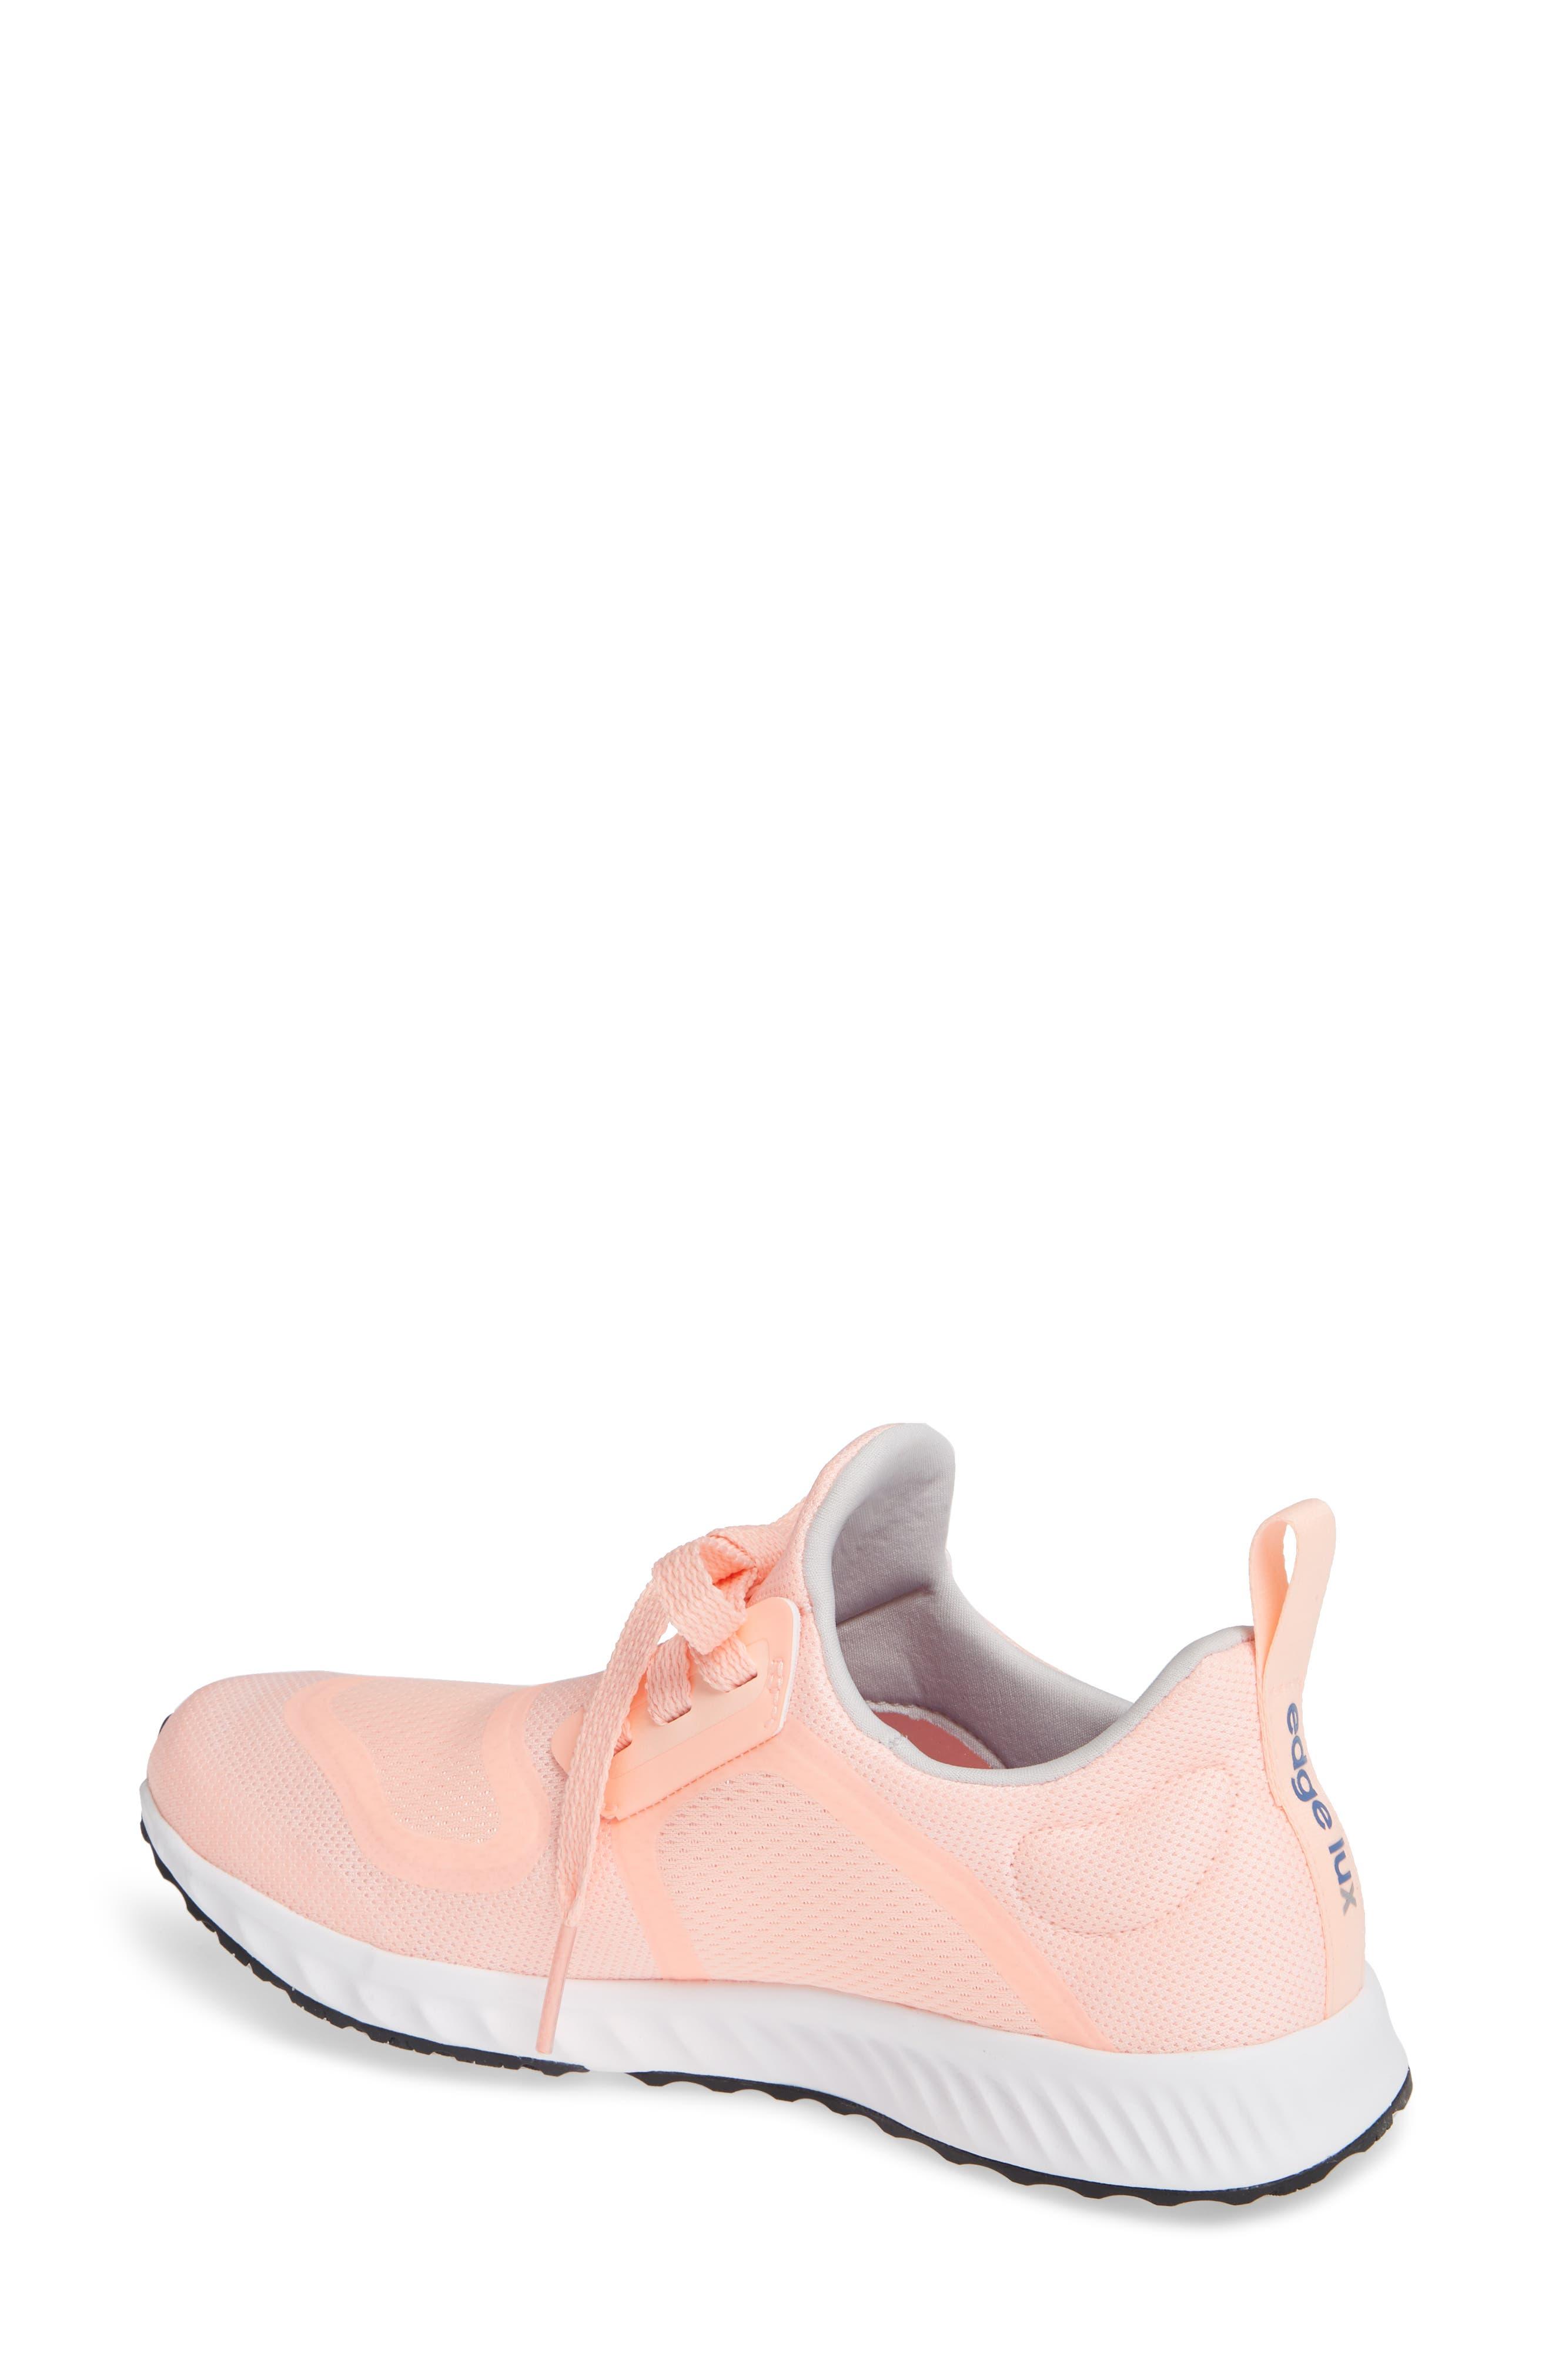 Edge Lux Clima Running Shoe,                             Alternate thumbnail 2, color,                             Clear Orange/ White